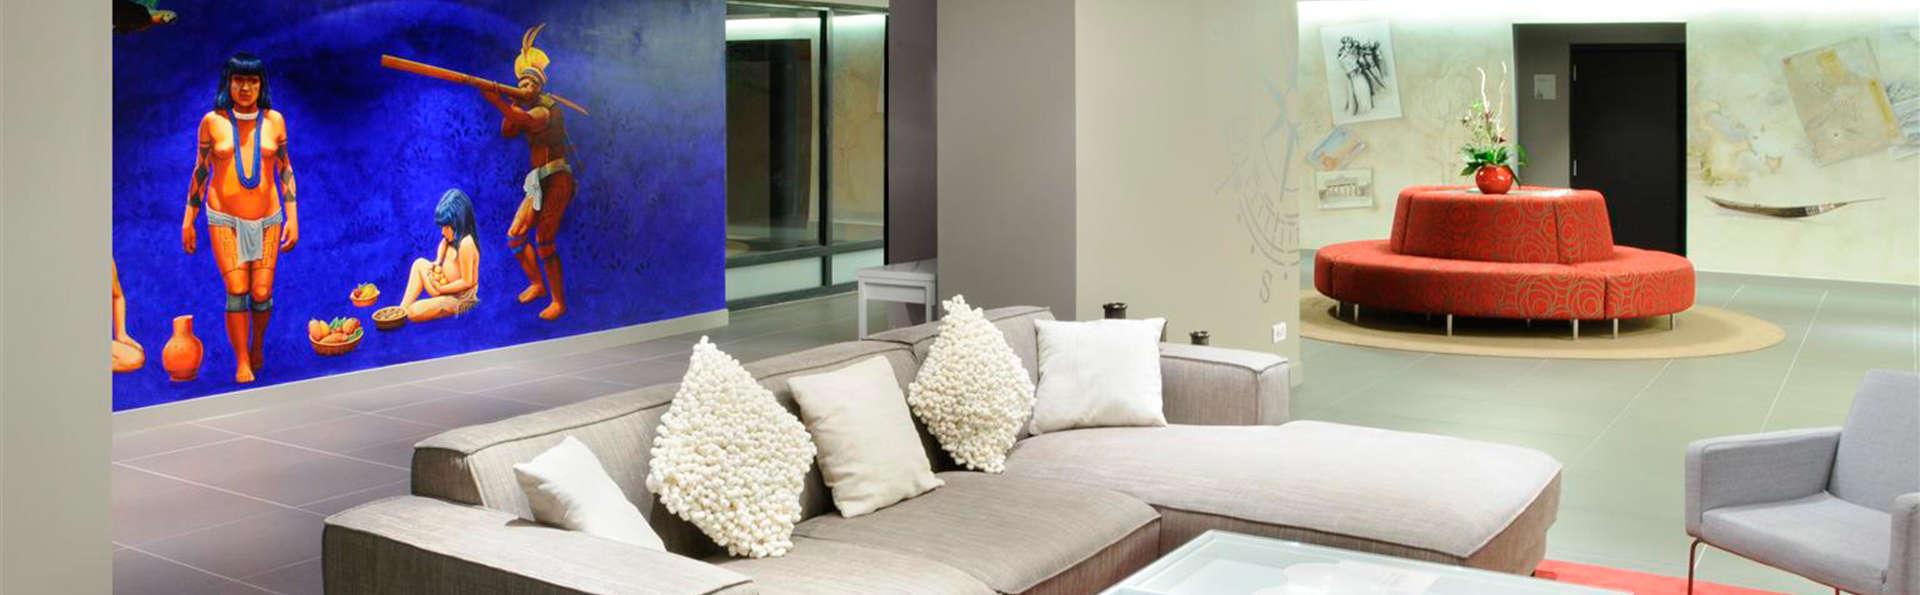 Best Western Plus - Hôtel de Chassieu - EDIT_lobby.jpg